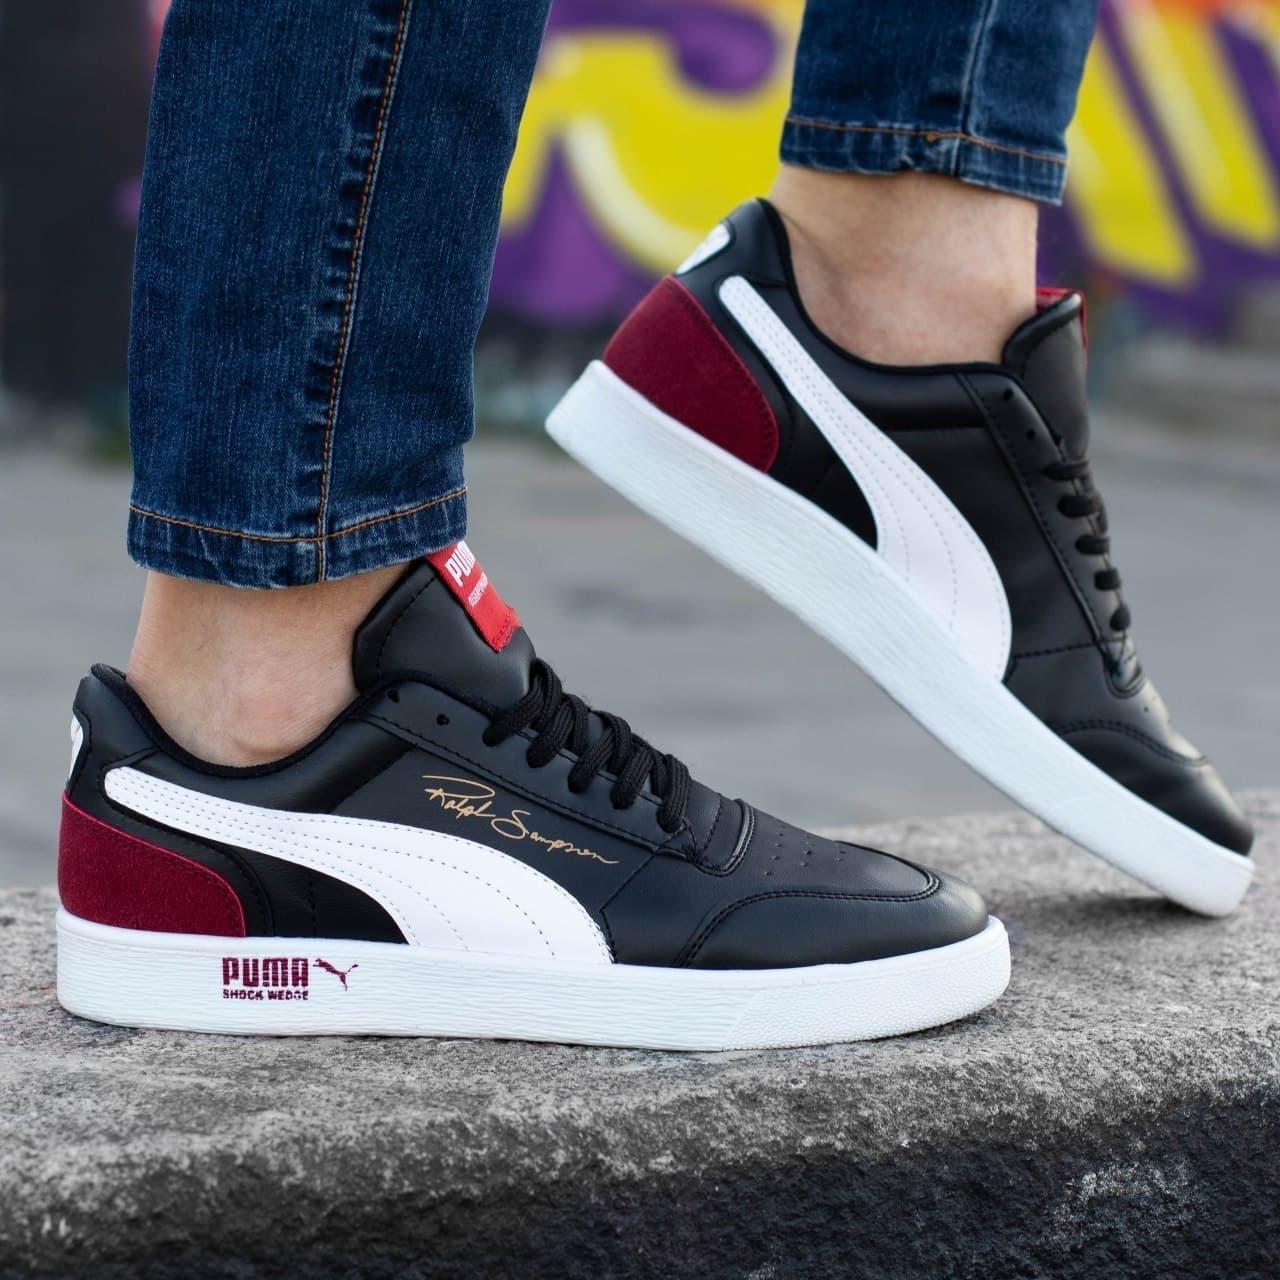 Мужские кроссовки Puma Ralph Sampsone Black/White/Red